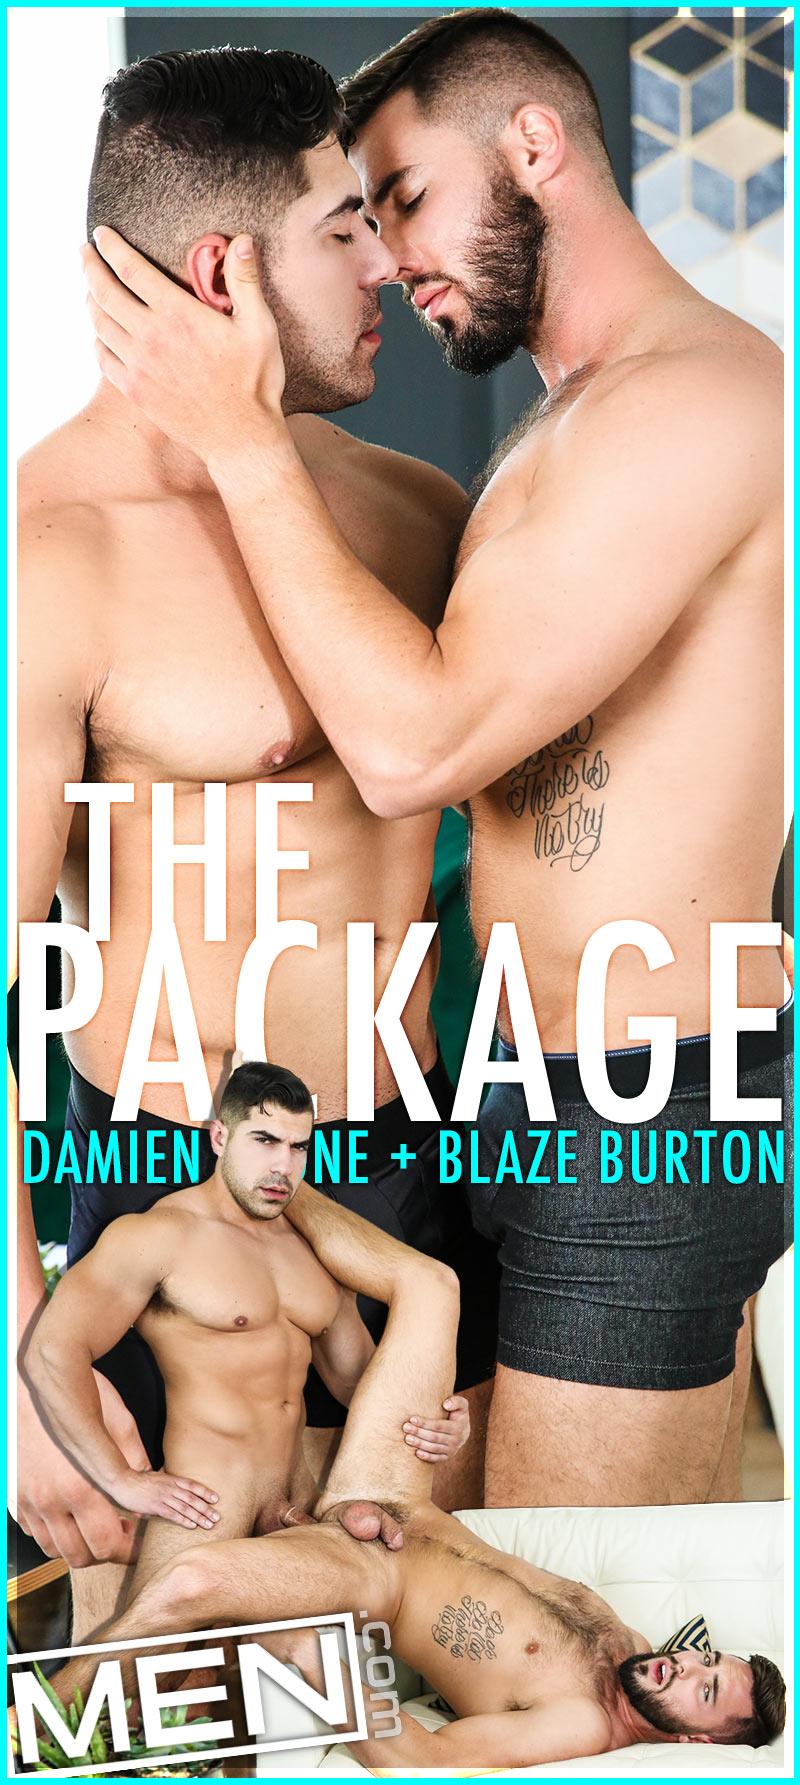 The Package (Damien Stone Fucks Blaze Burton) at Str8 To Gay